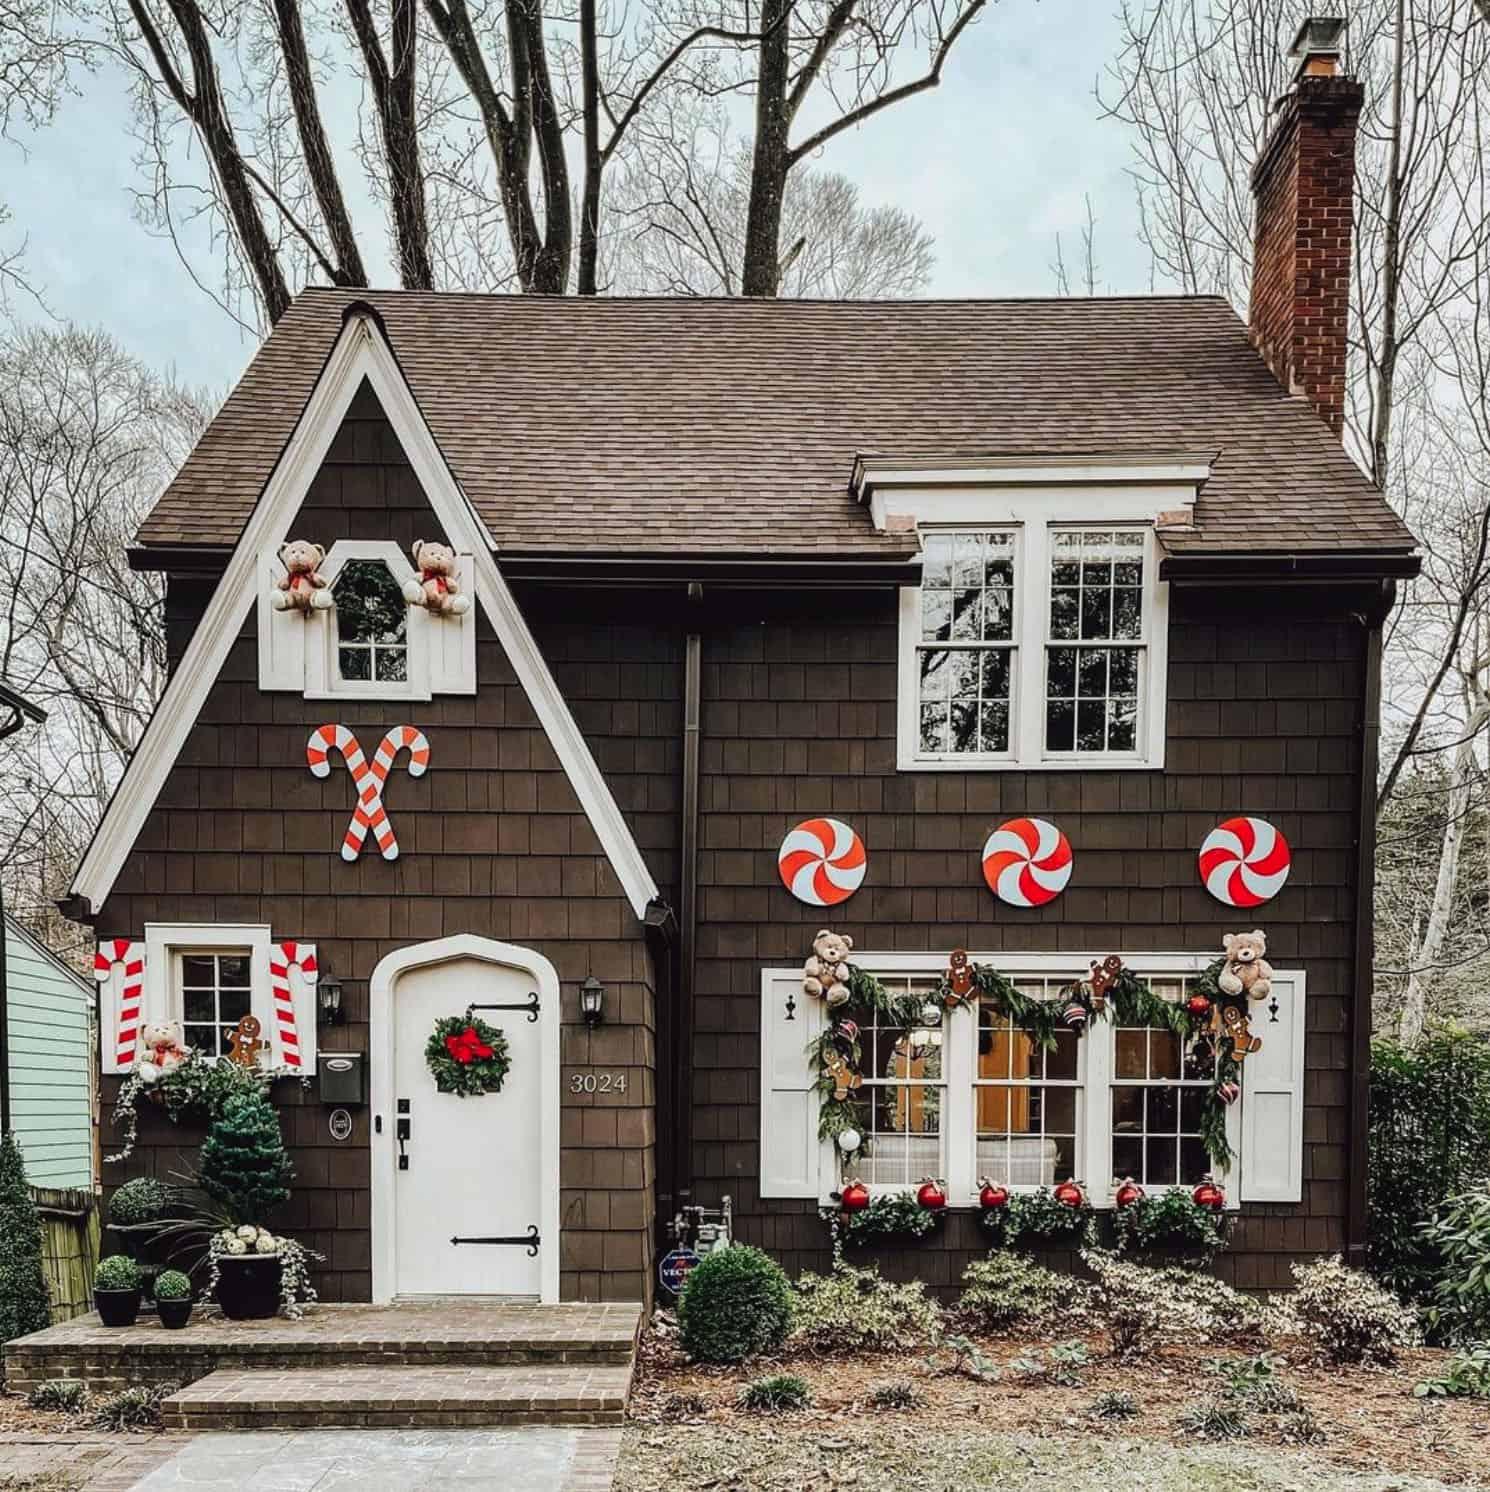 holiday-decor-ideas-gingerbread-house